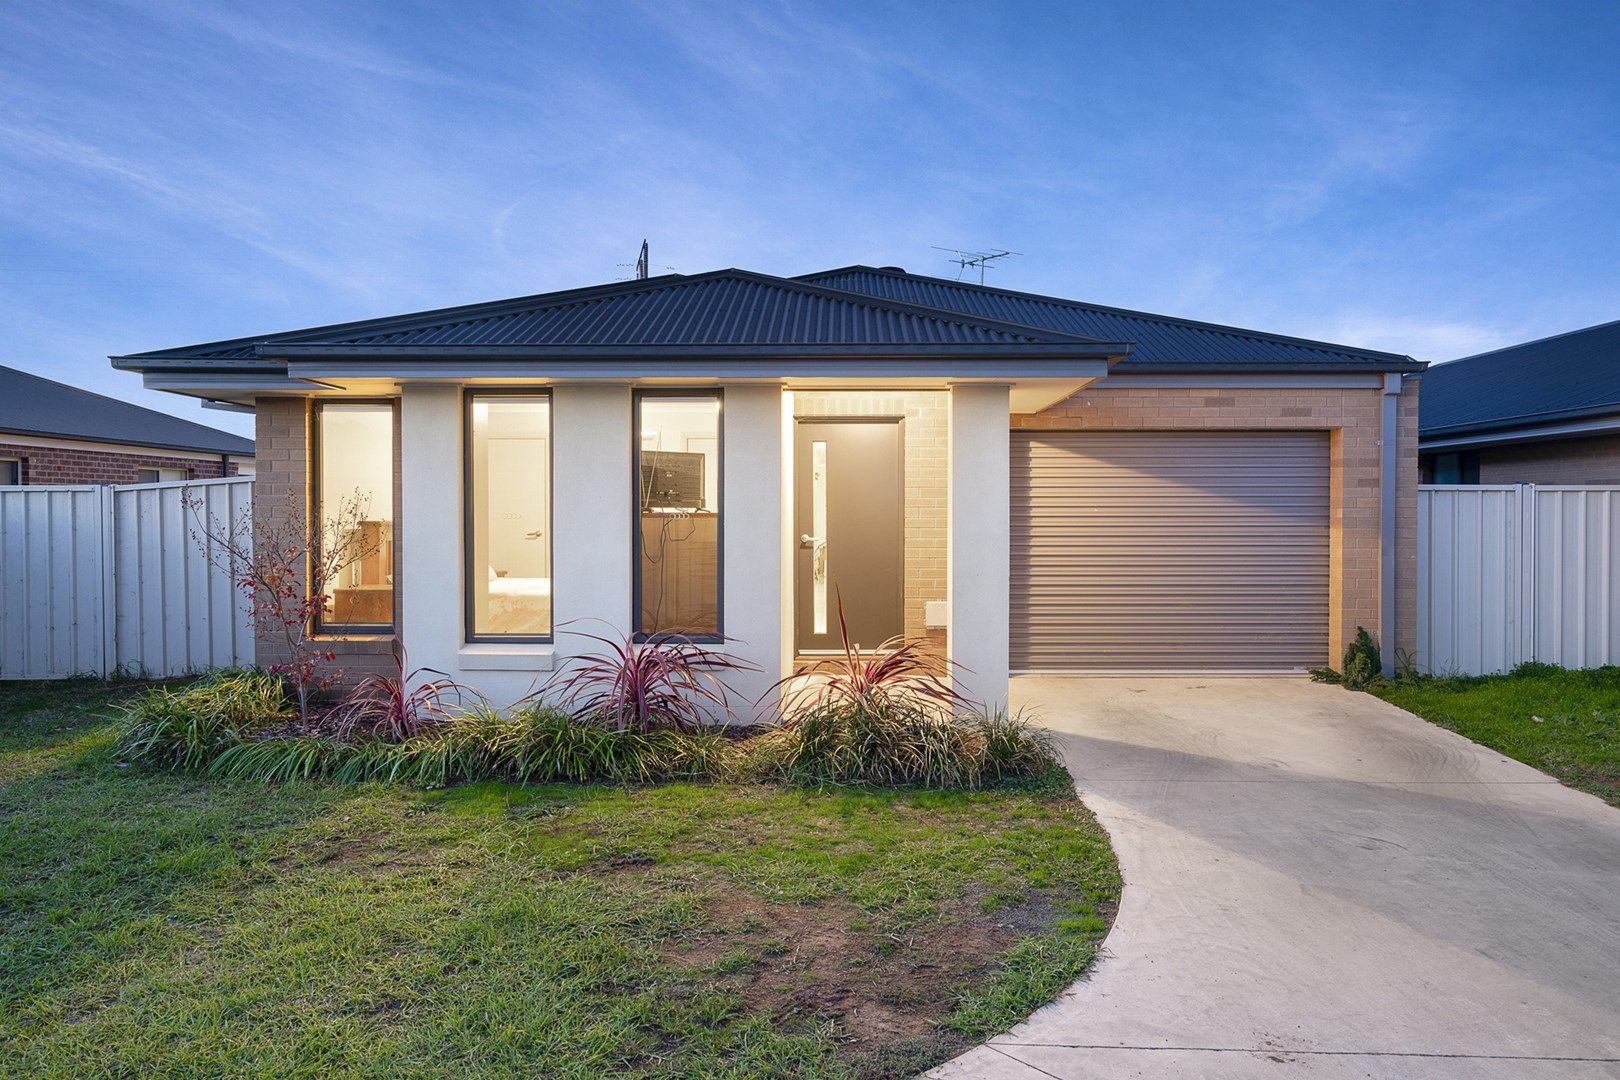 3/47 Hanrahan  Street, Lavington NSW 2641, Image 1